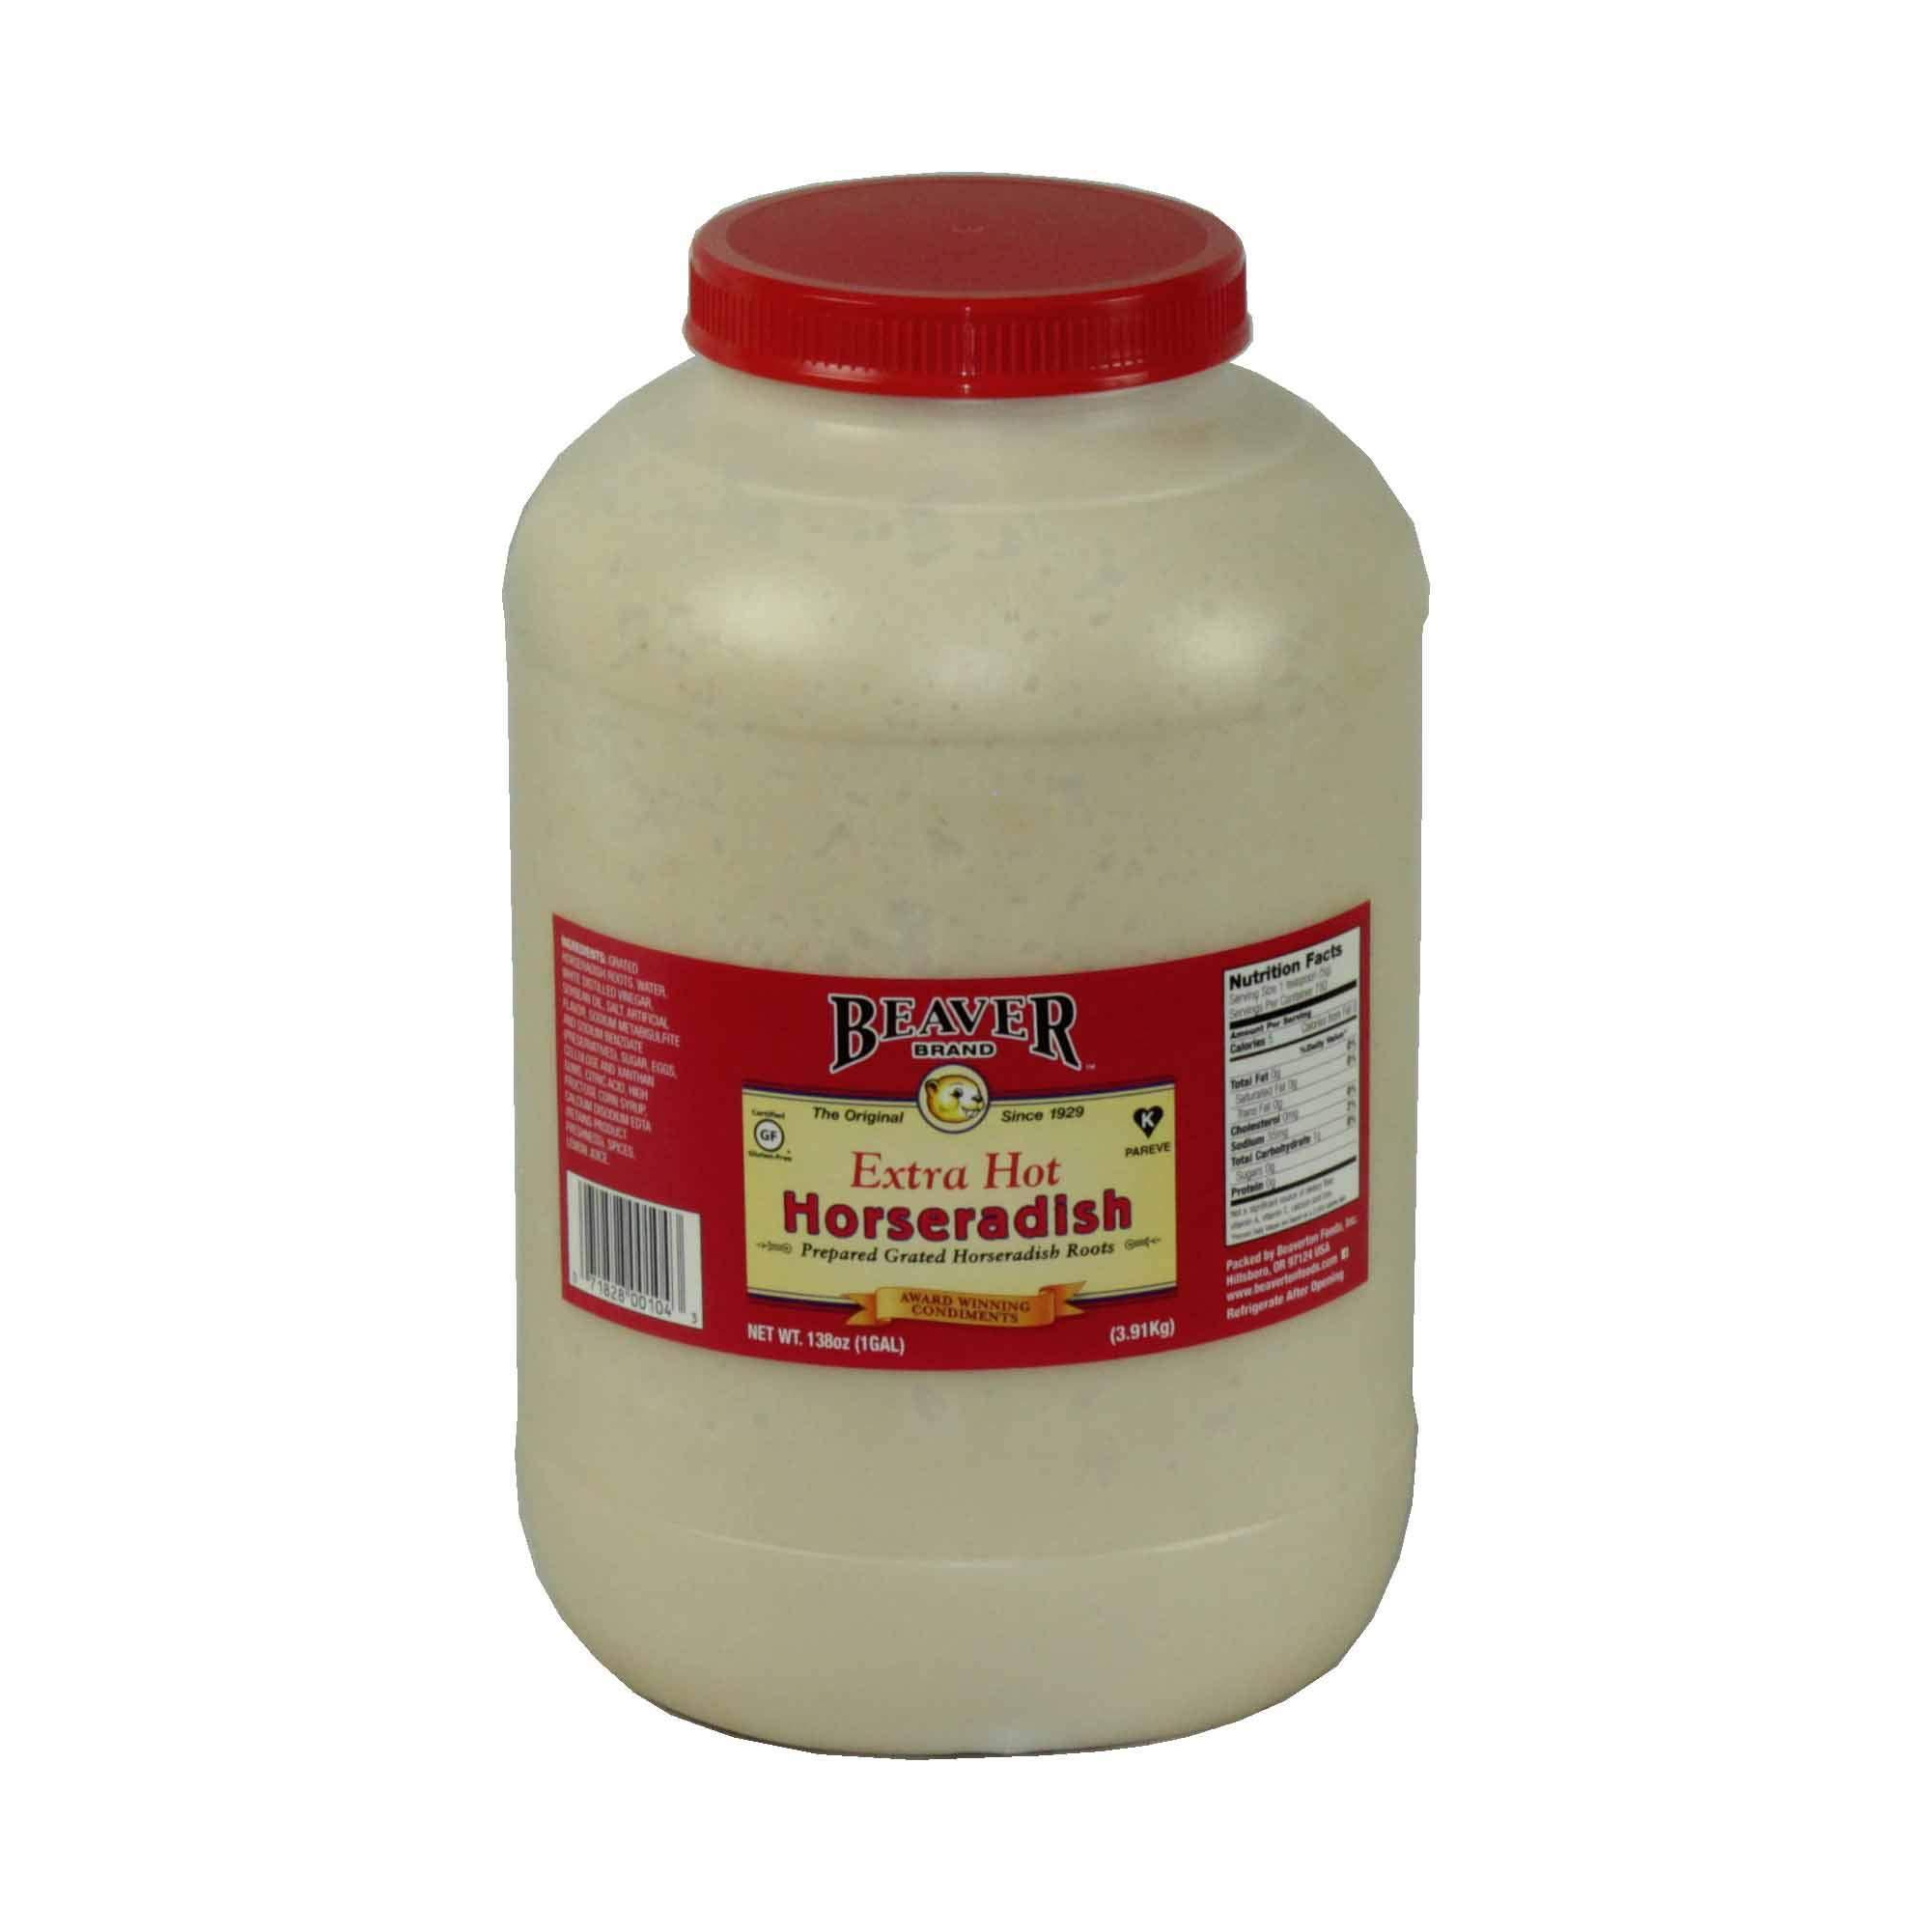 Beaver Extra Hot Horseradish, 139 Ounce - 2 per case.